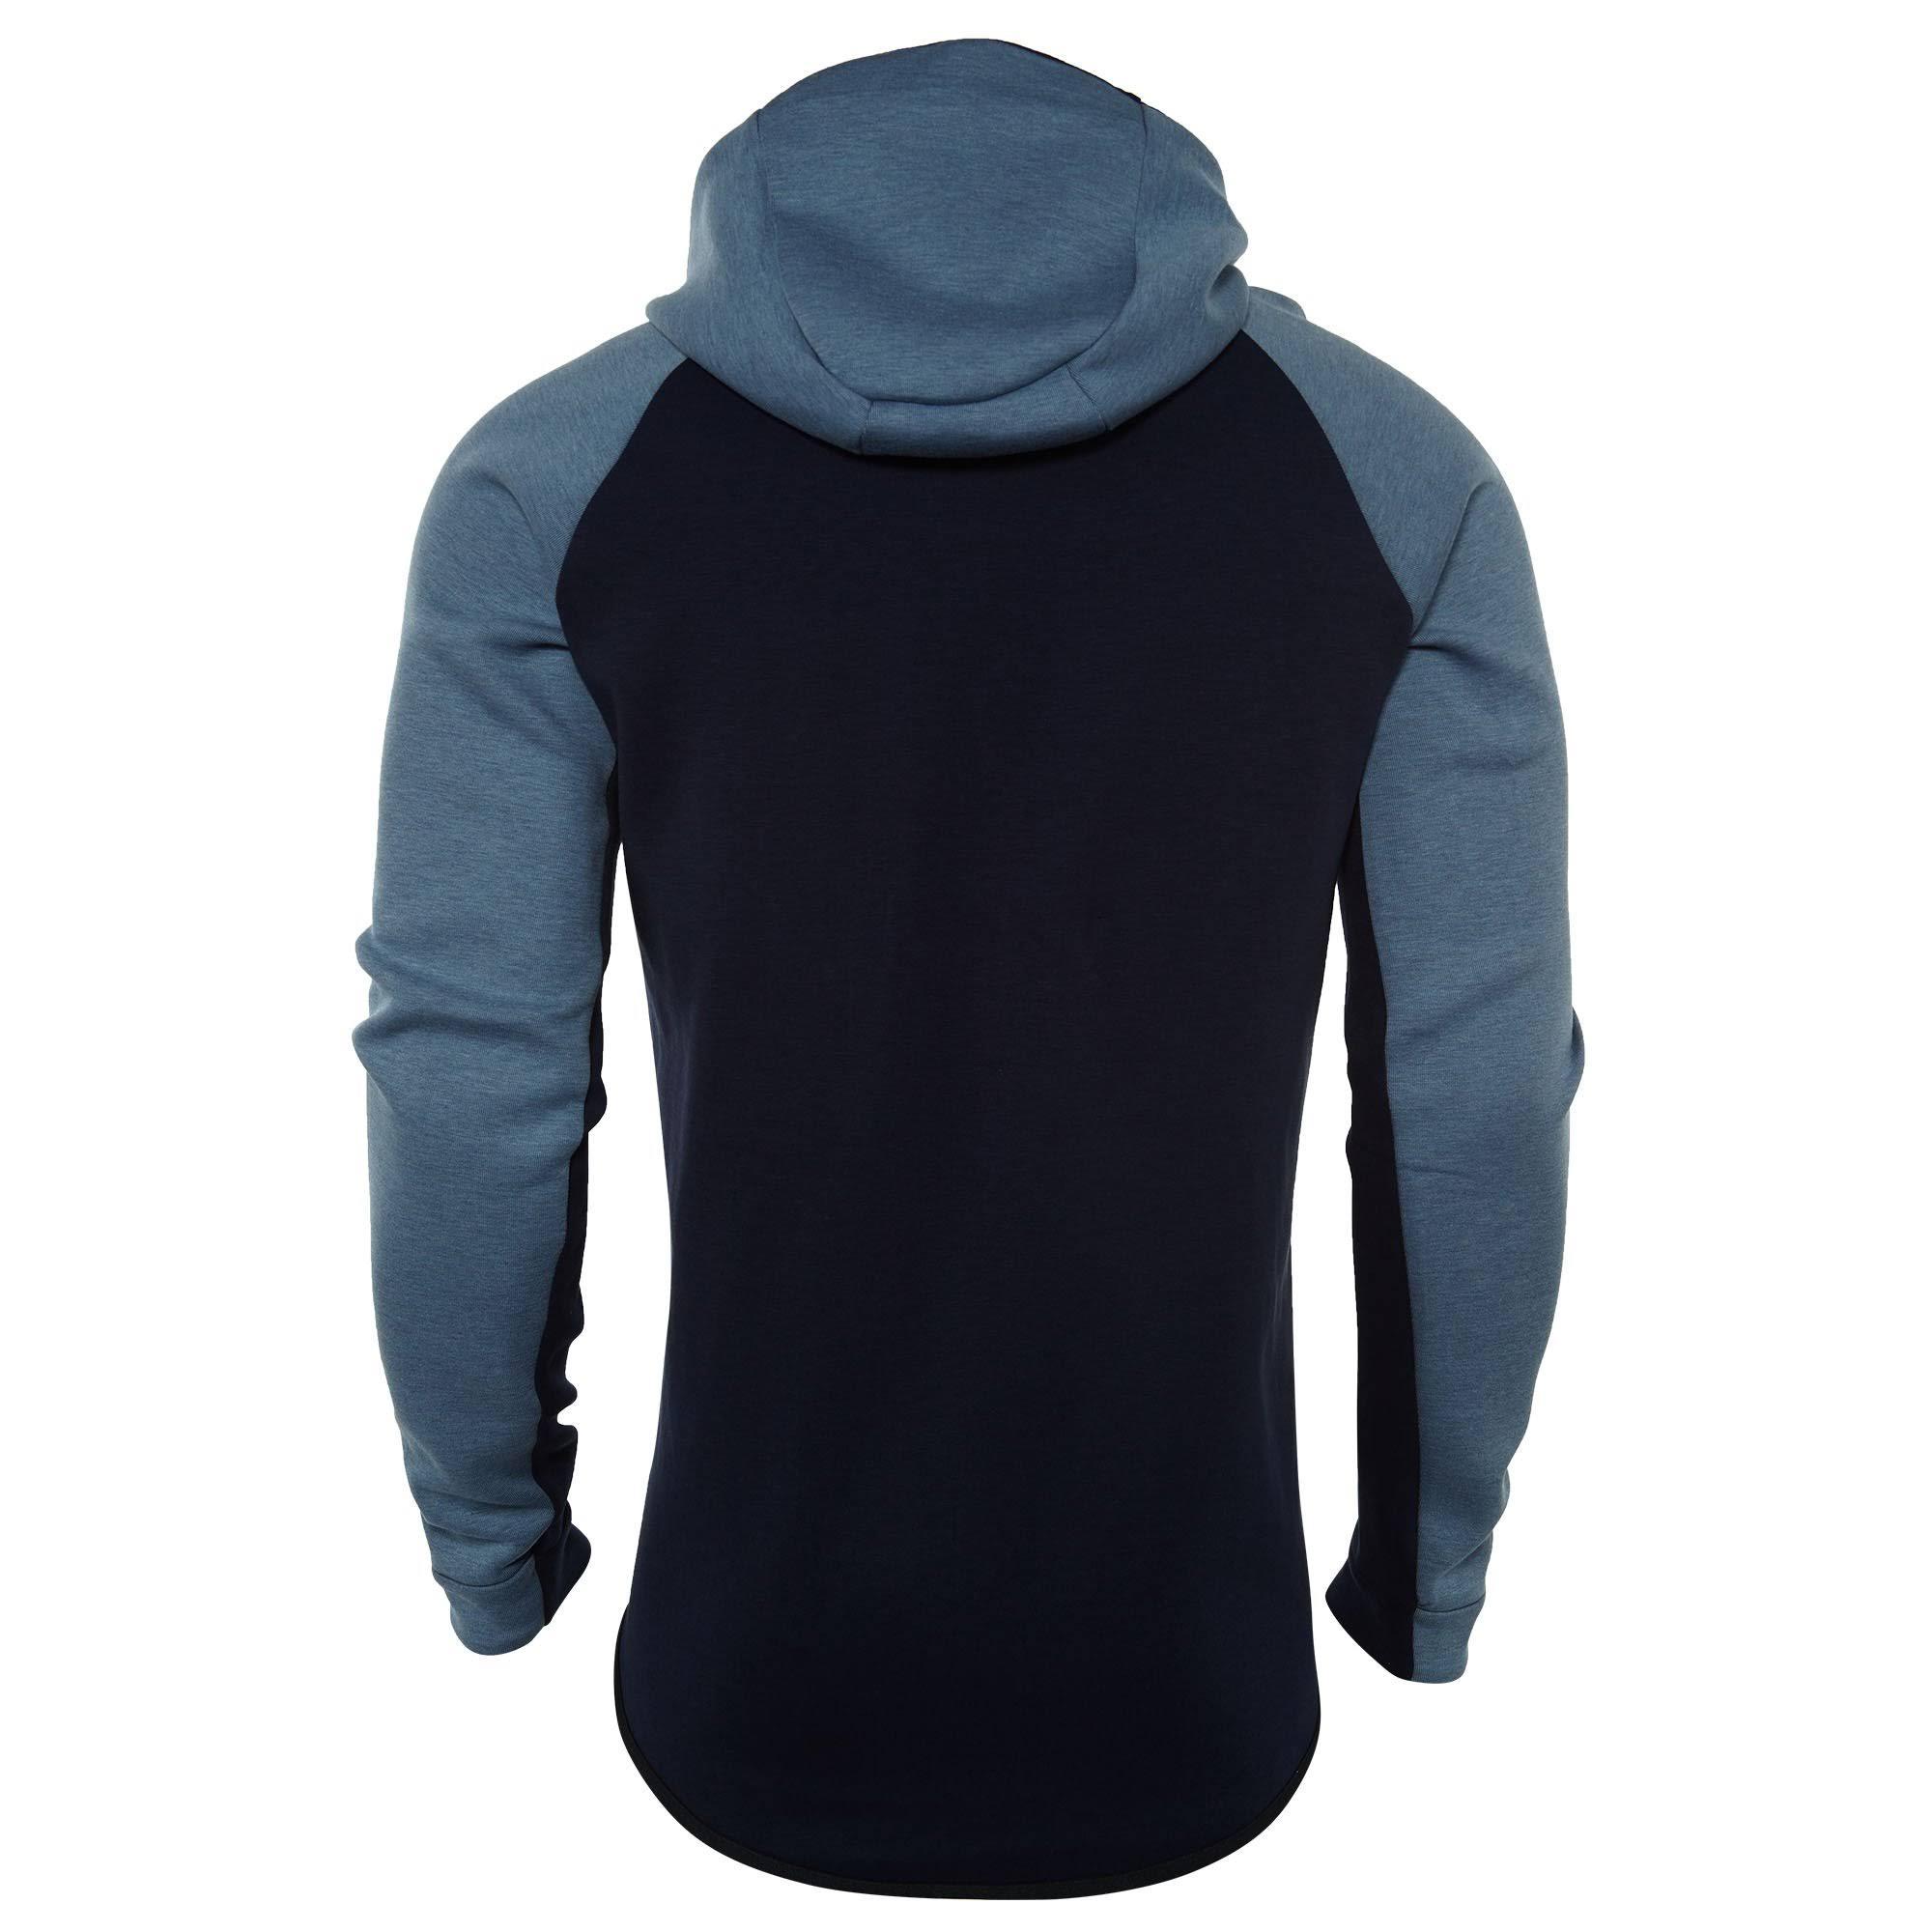 Nike Con Completa Estilo Capucha Windrunner Hombre Sportswear Tech Cremallera Sudadera 885904 Para Fleece Y TdXqTw